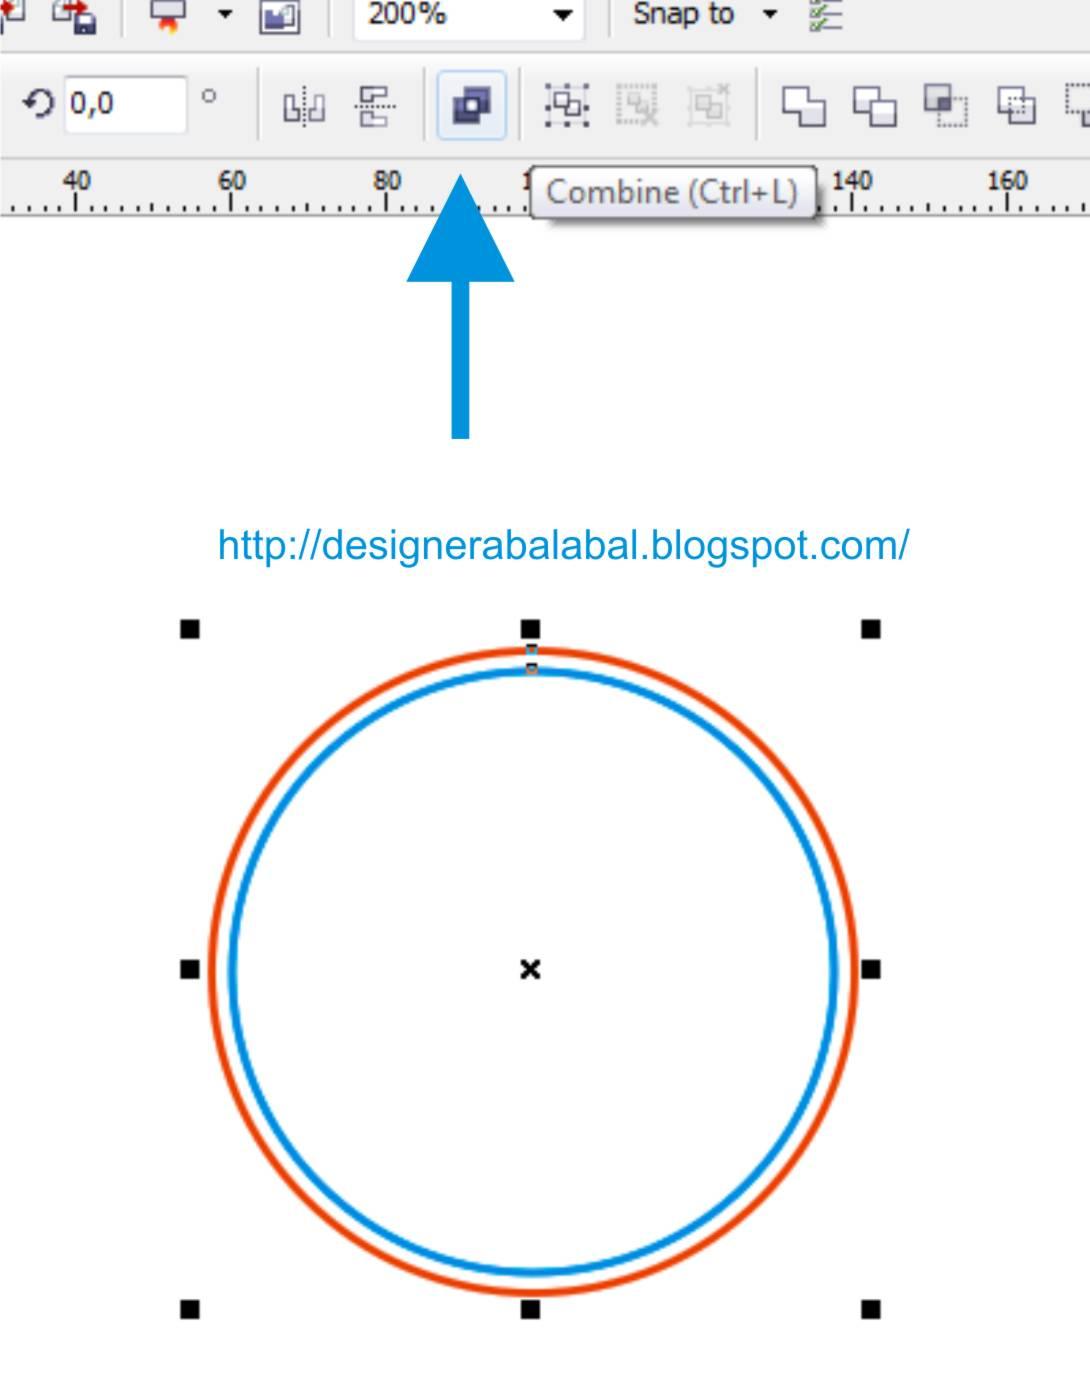 Cara Membuat Stempel Terlihat Lebih Nyata dengan CorelDRAW | Belajar CorelDRAW - #tukangketik